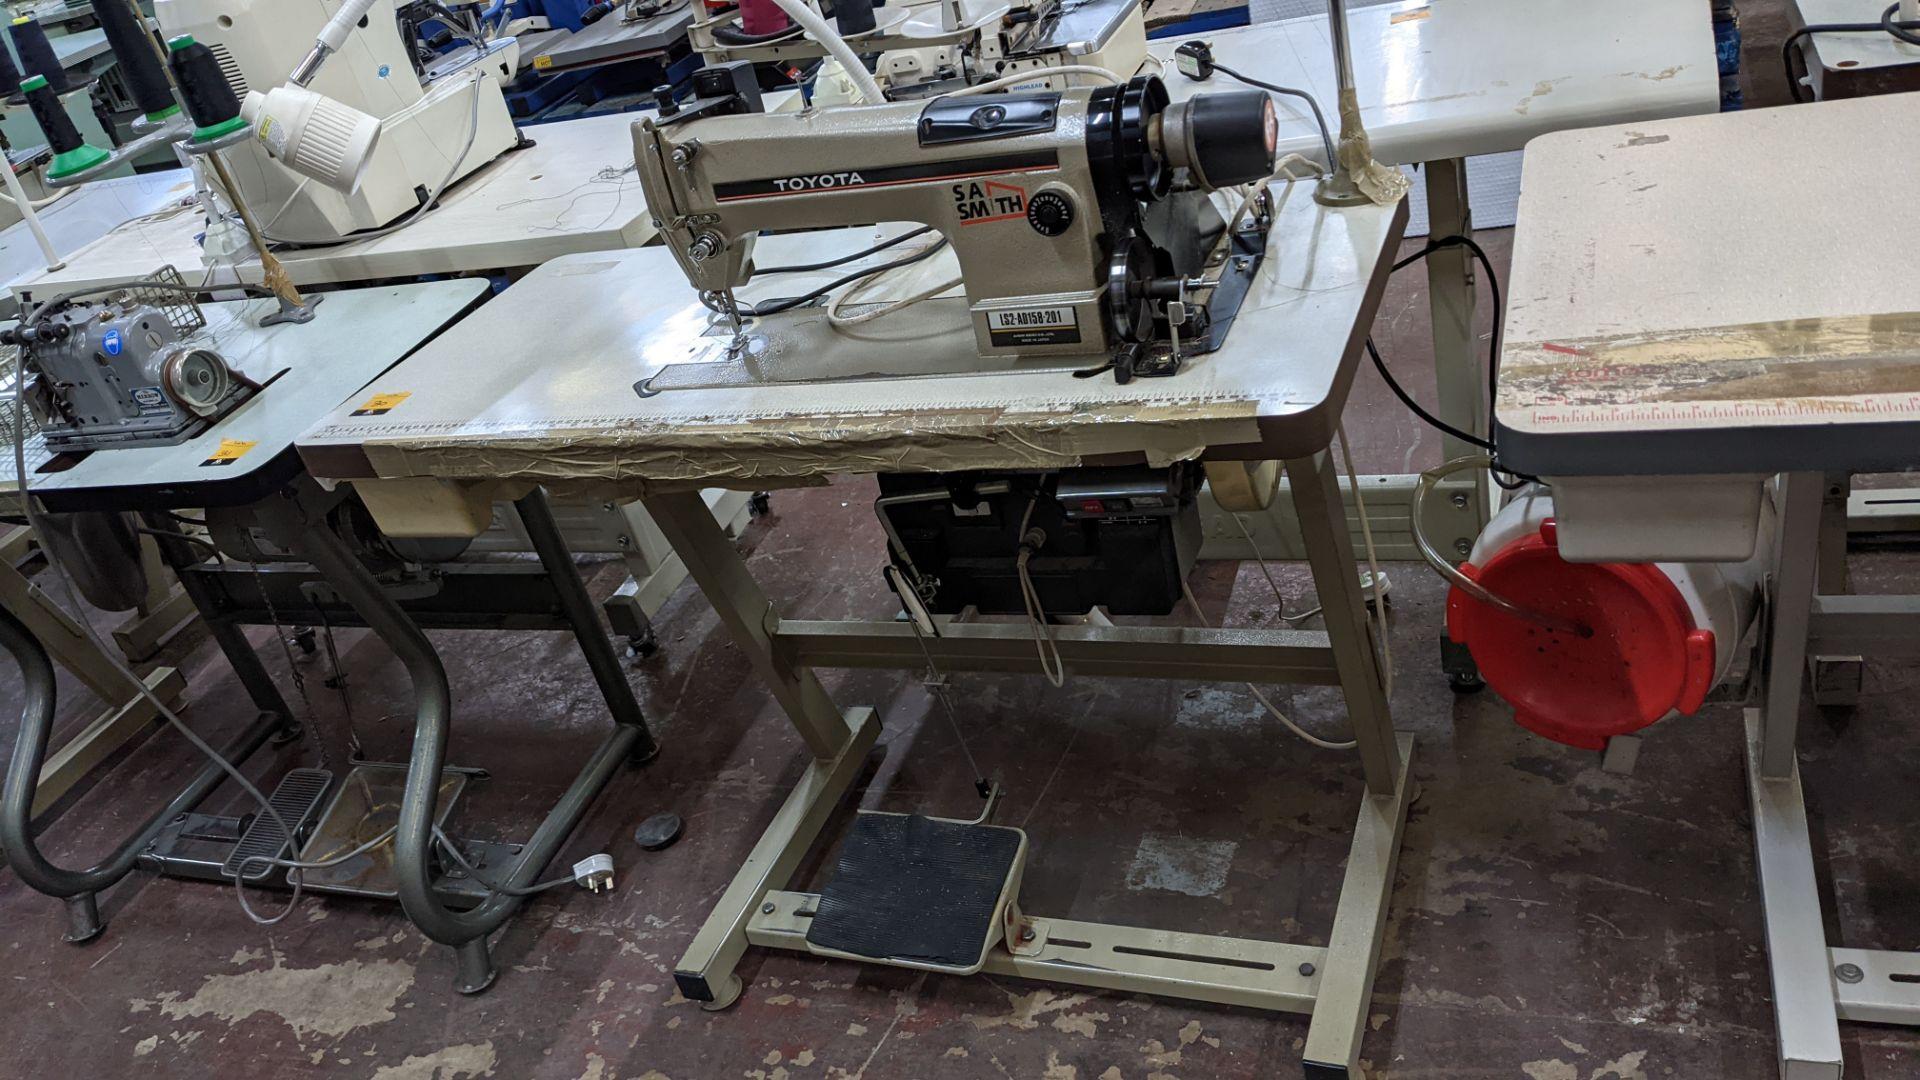 Toyota sewing machine - Image 2 of 17